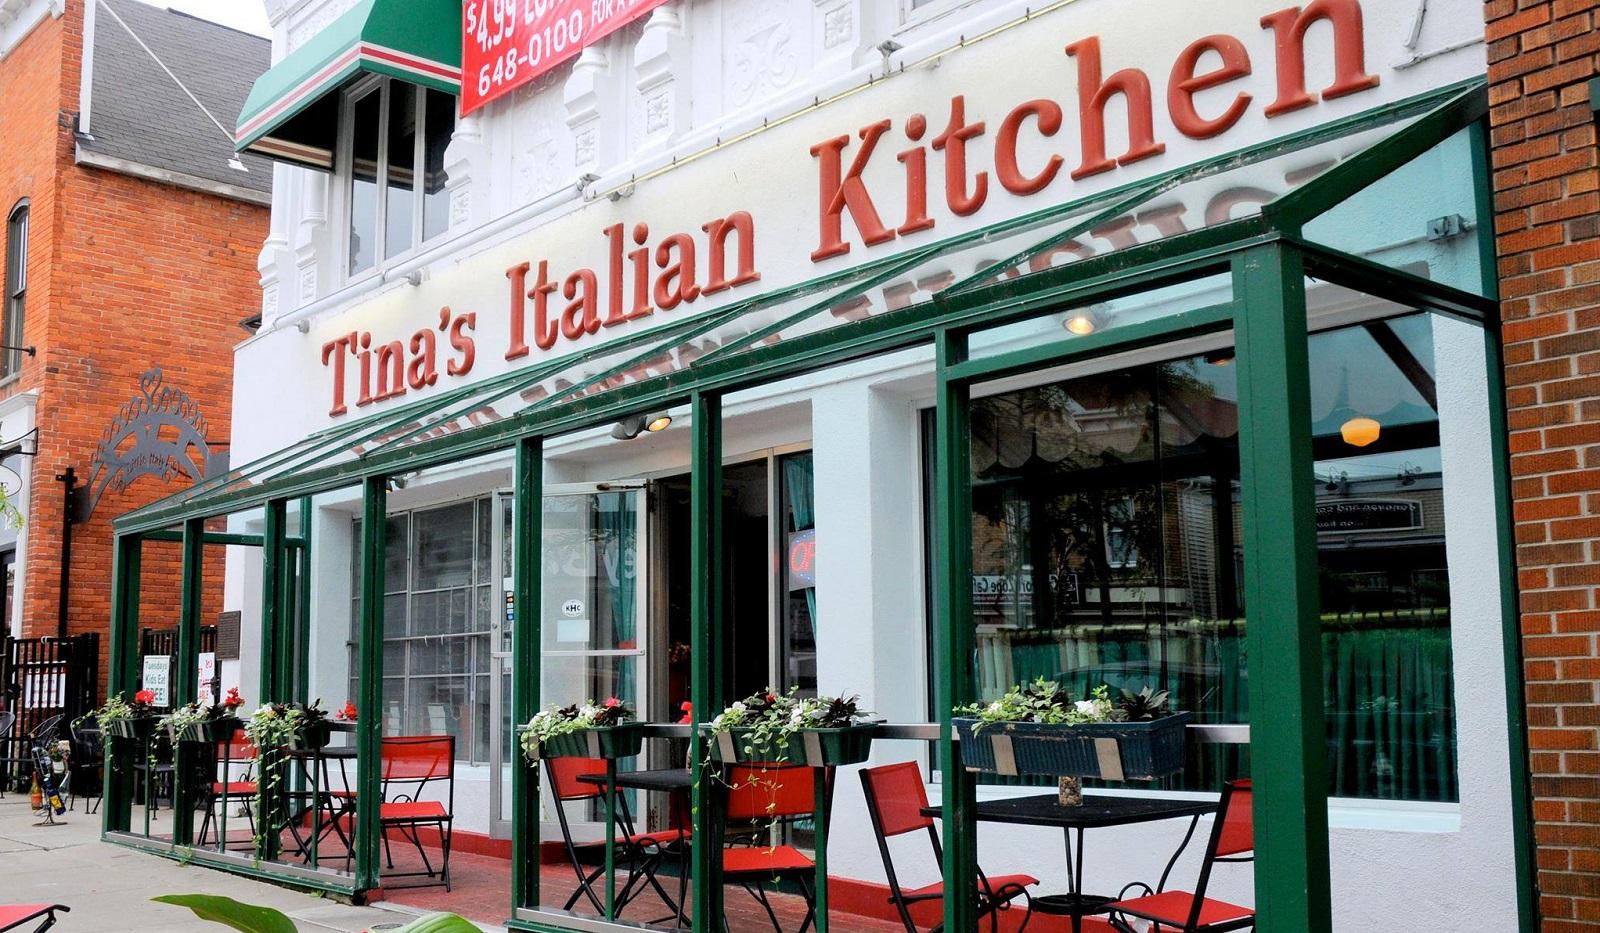 Tina's Italian Kitchen has announced its closing date. (via Tina's Italian Kitchen's Facebook page)